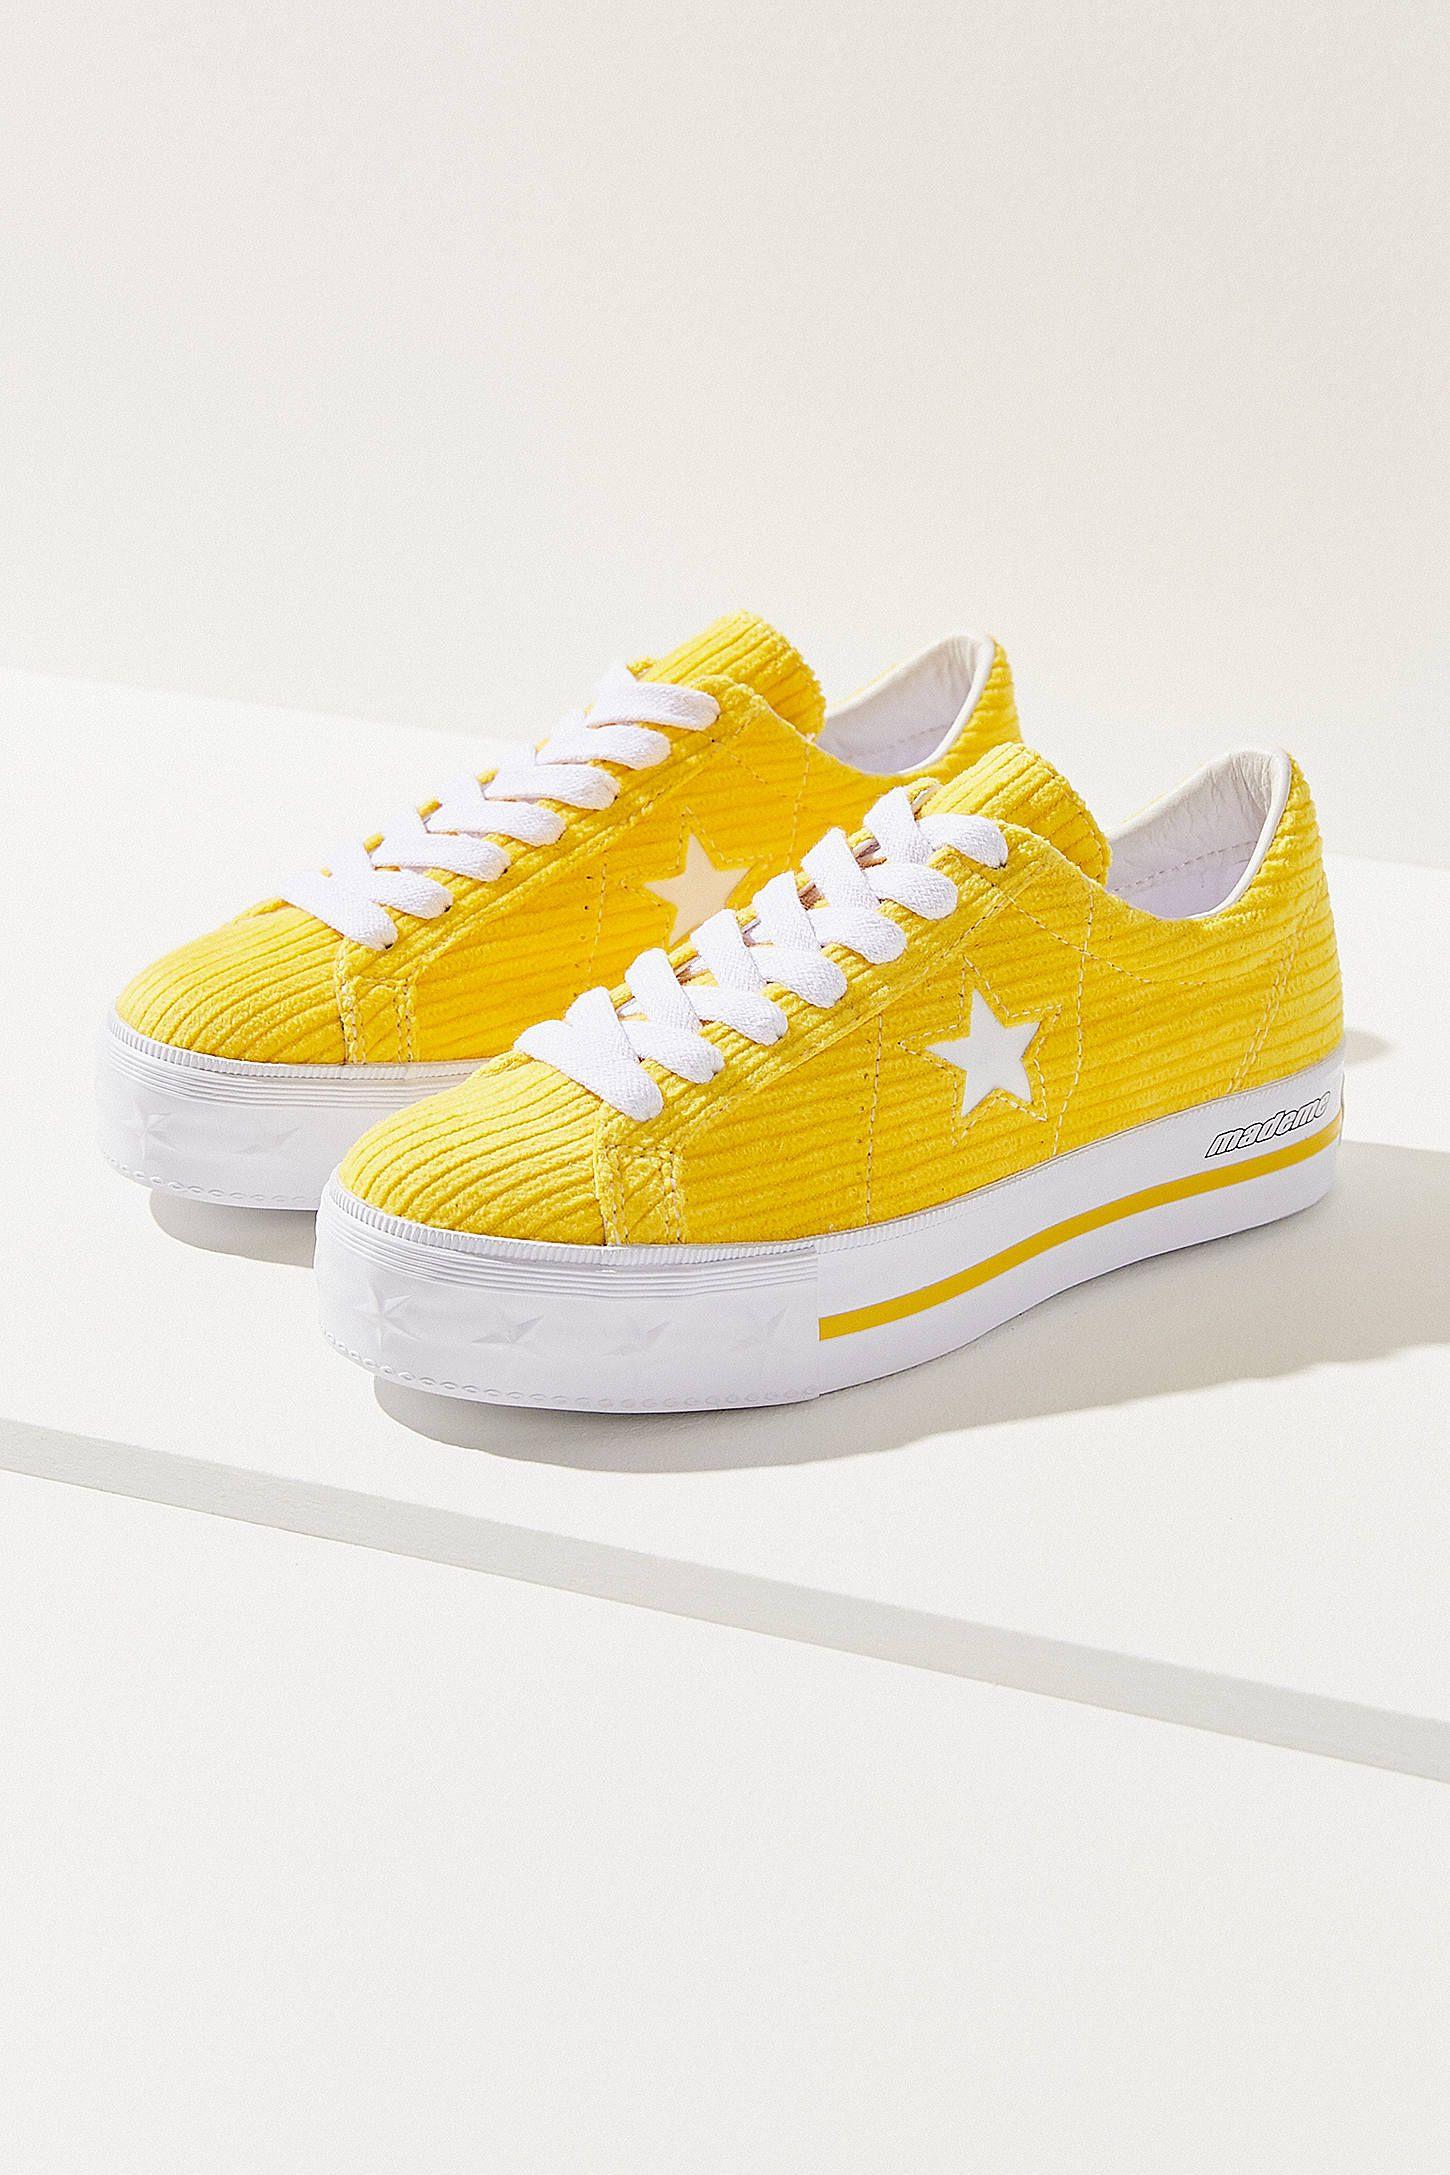 d325e932cdfac7 Converse One Star X MadeMe Corduroy Platform Sneaker